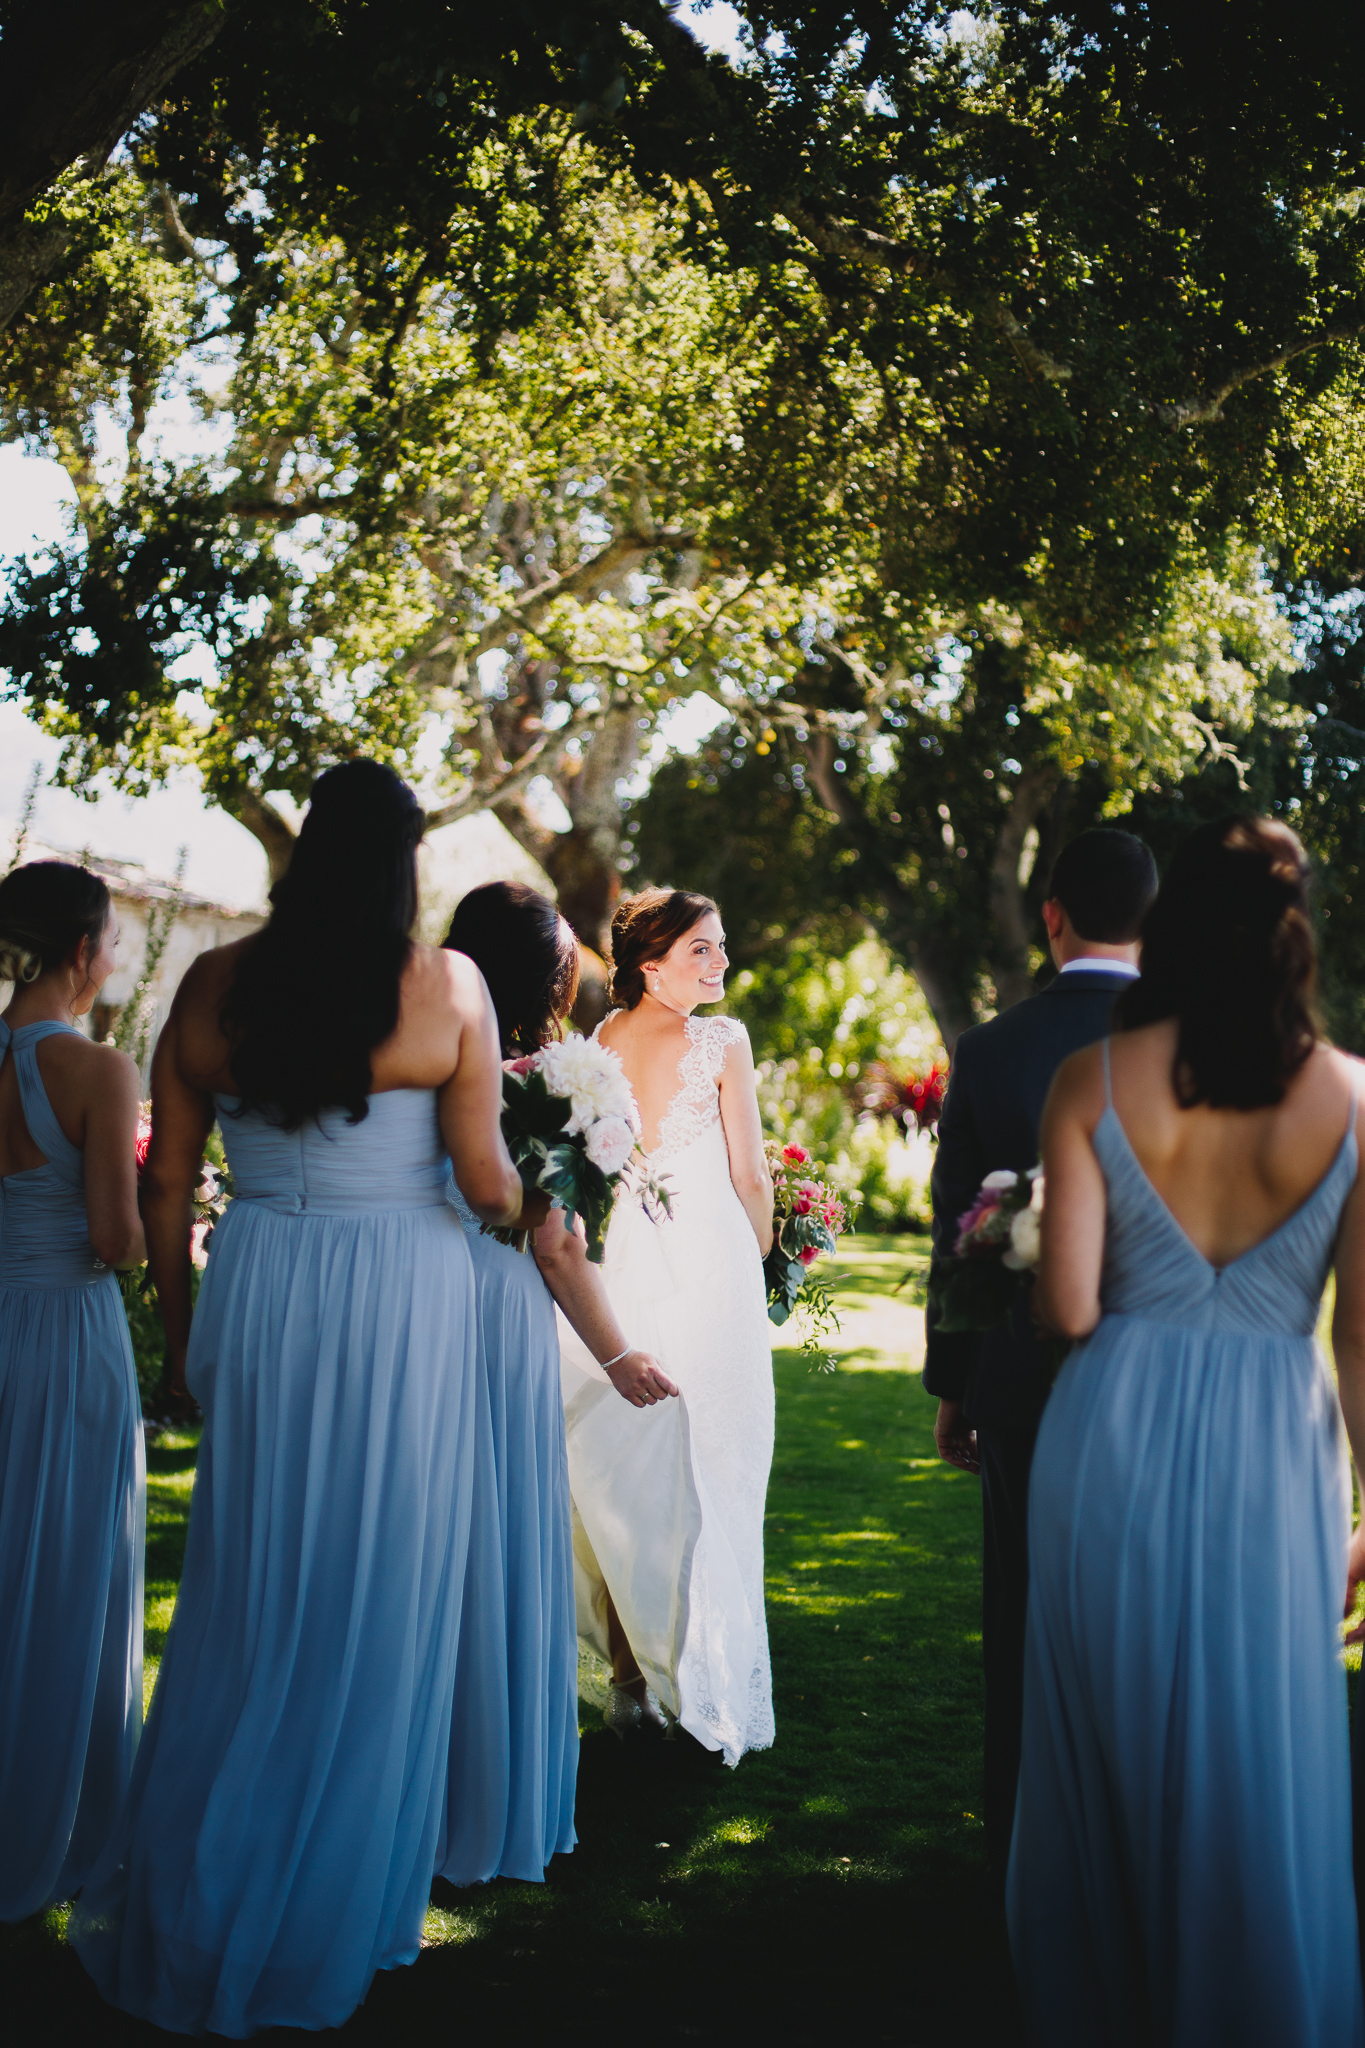 Archer Inspired Photography Carmel California Wedding Lifestyle Documentary Photographer Bride and Groom-10.jpg